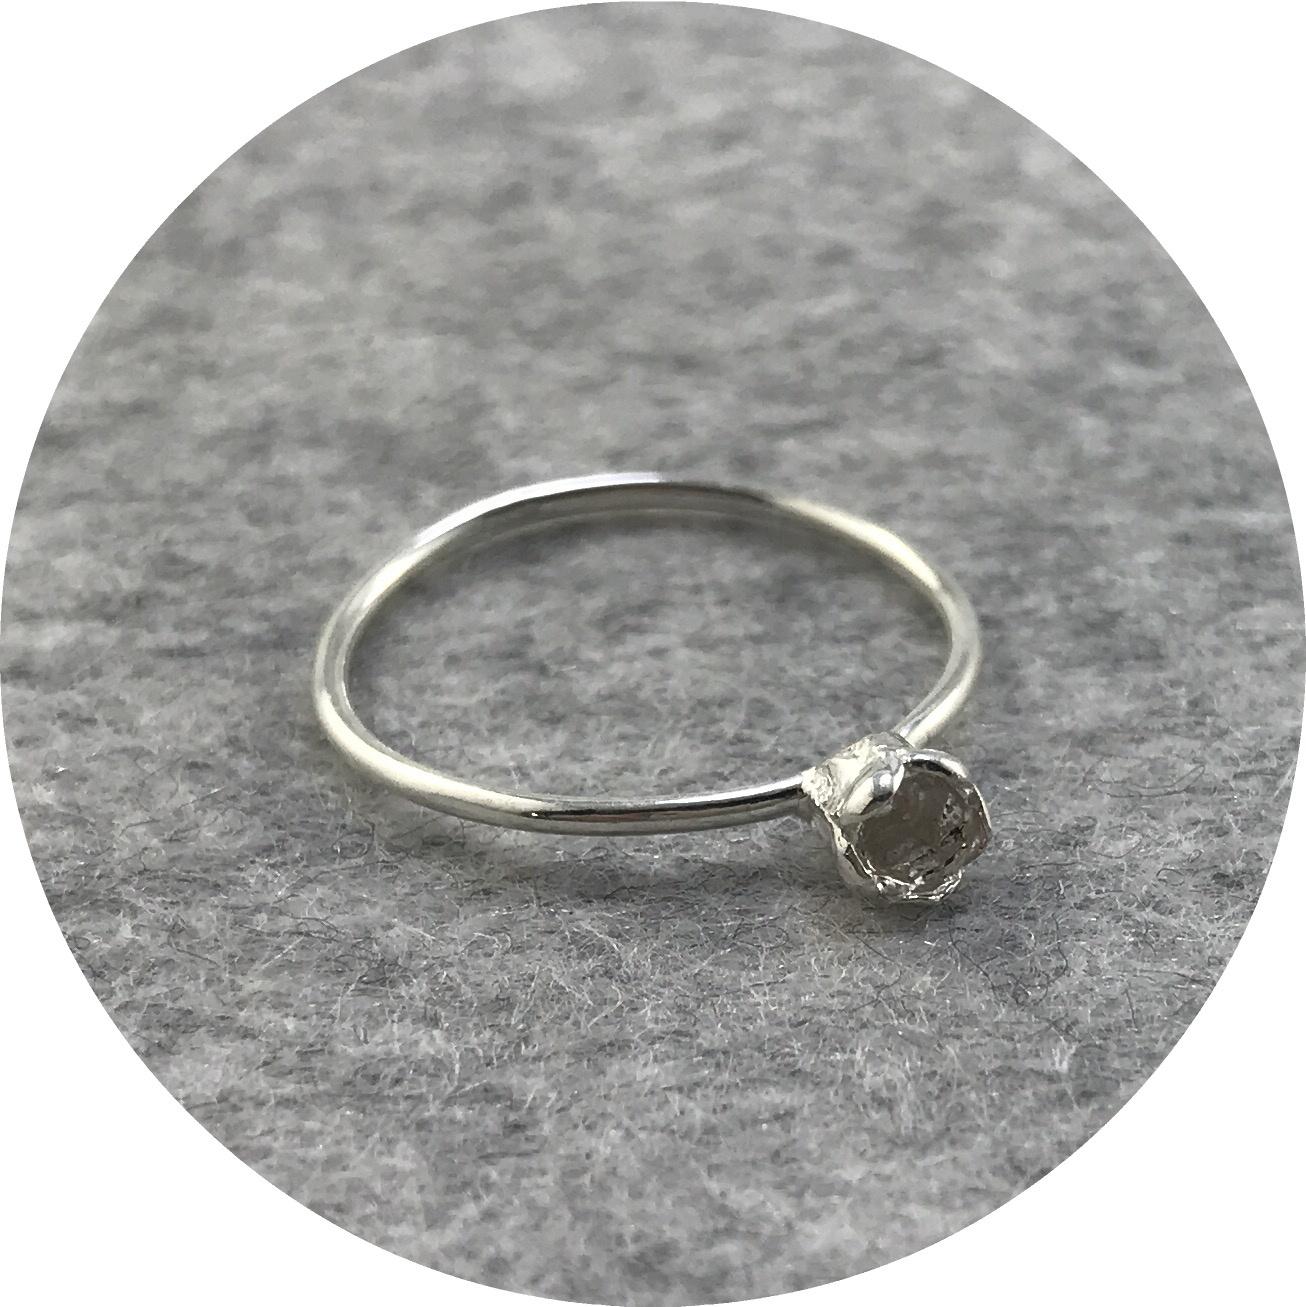 Abby Seymour- Melaleuca pod ring. Sterling silver. size K1/2